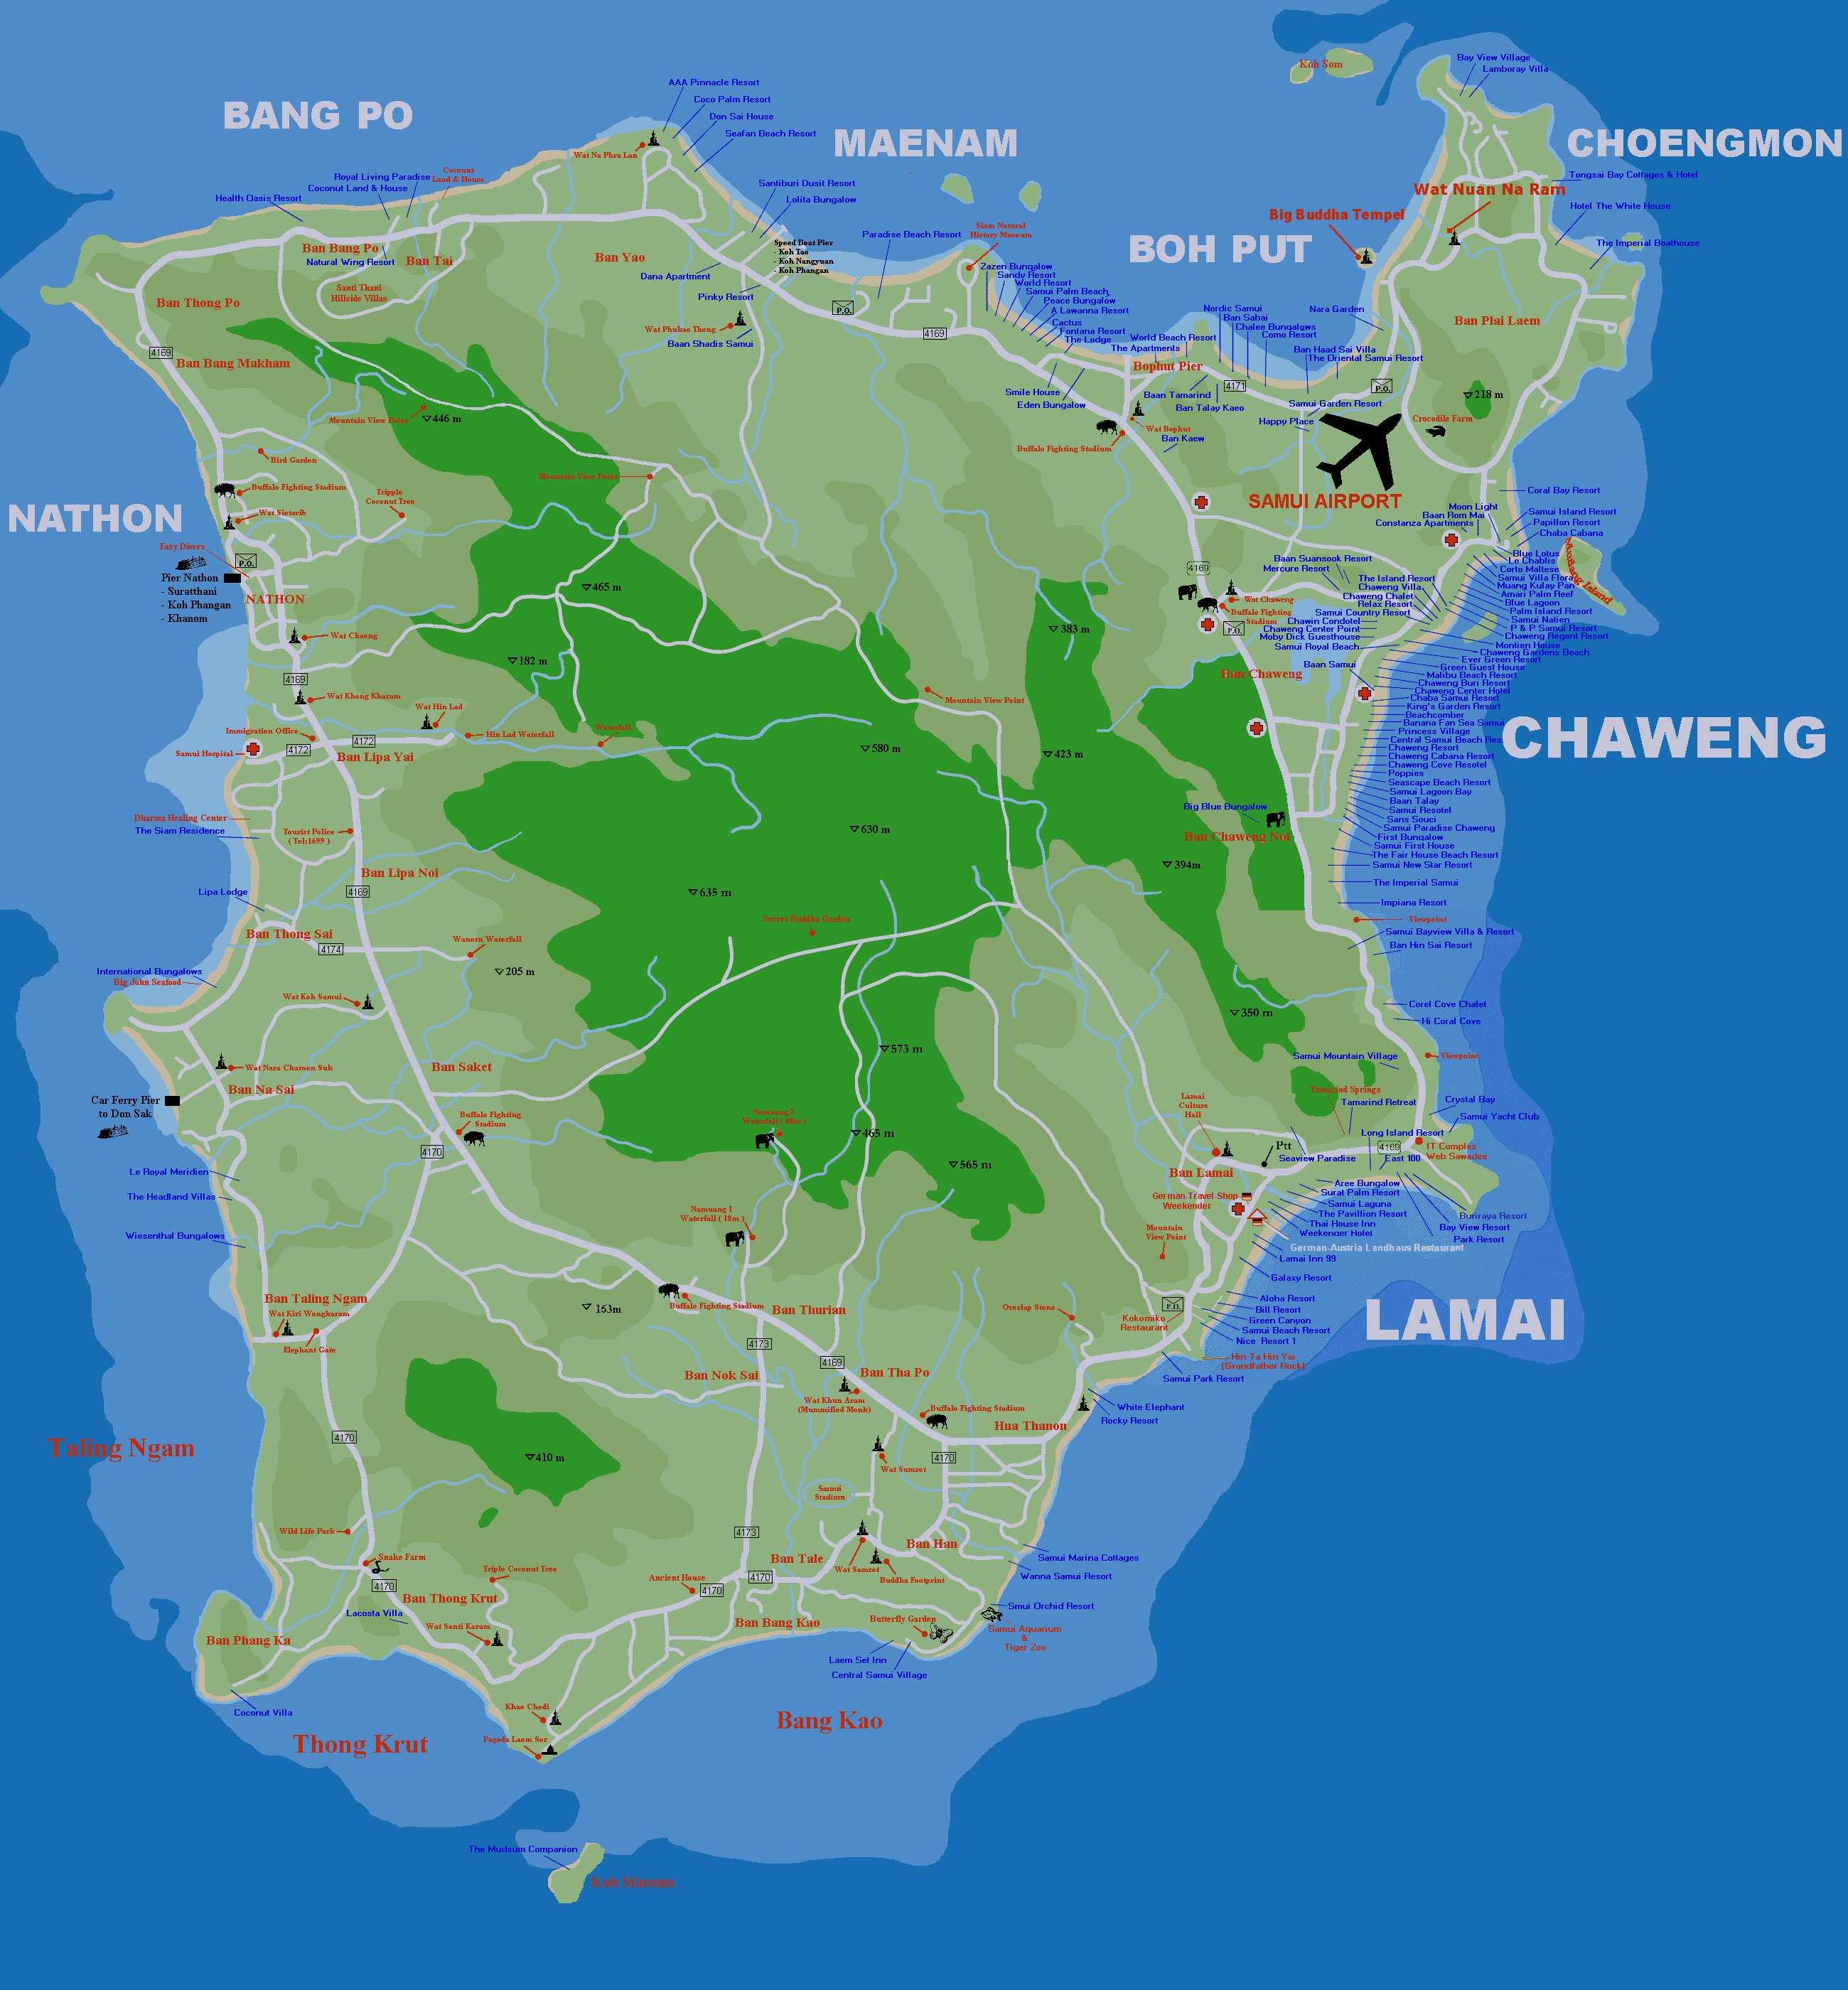 Koh Samui Map Large Ko Samui Maps for Free Download and Print | High Resolution  Koh Samui Map